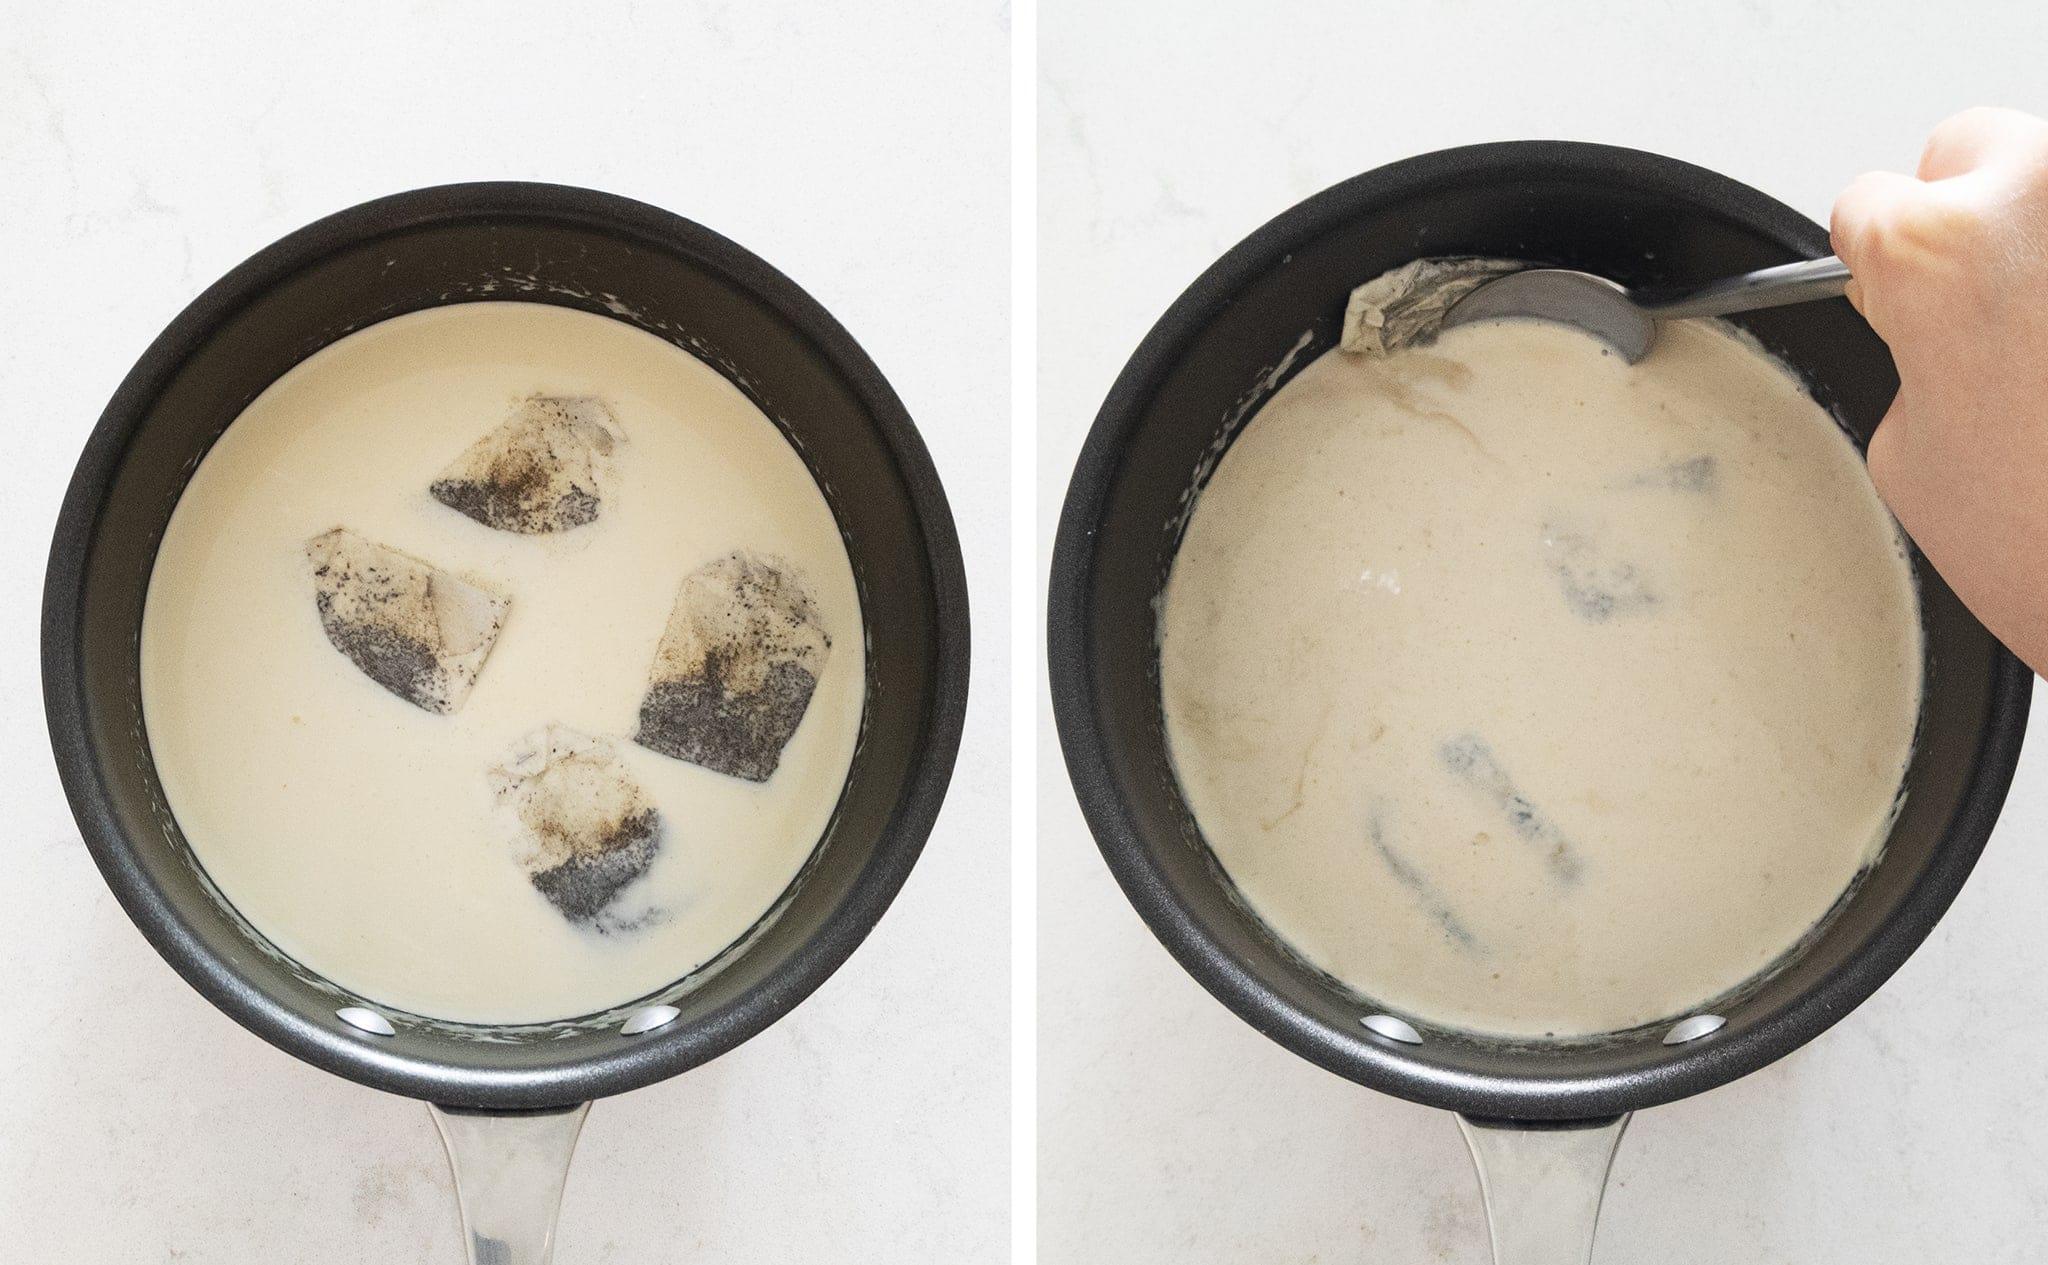 steeping milk with tea bags